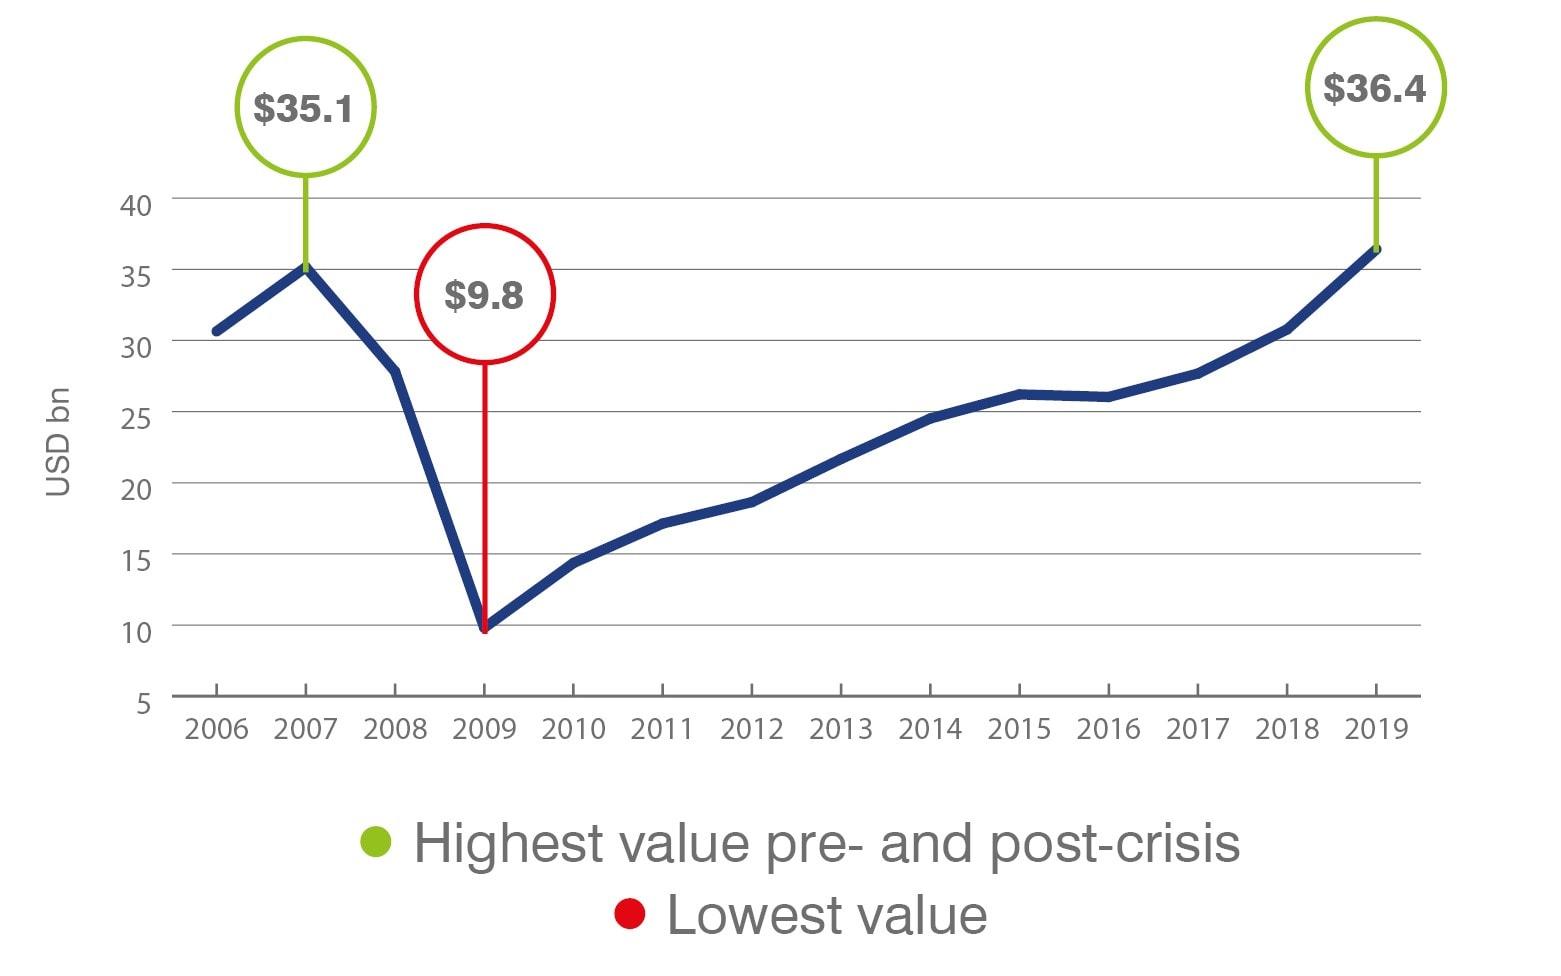 Citi: Brand Value over Time (2006-2019)